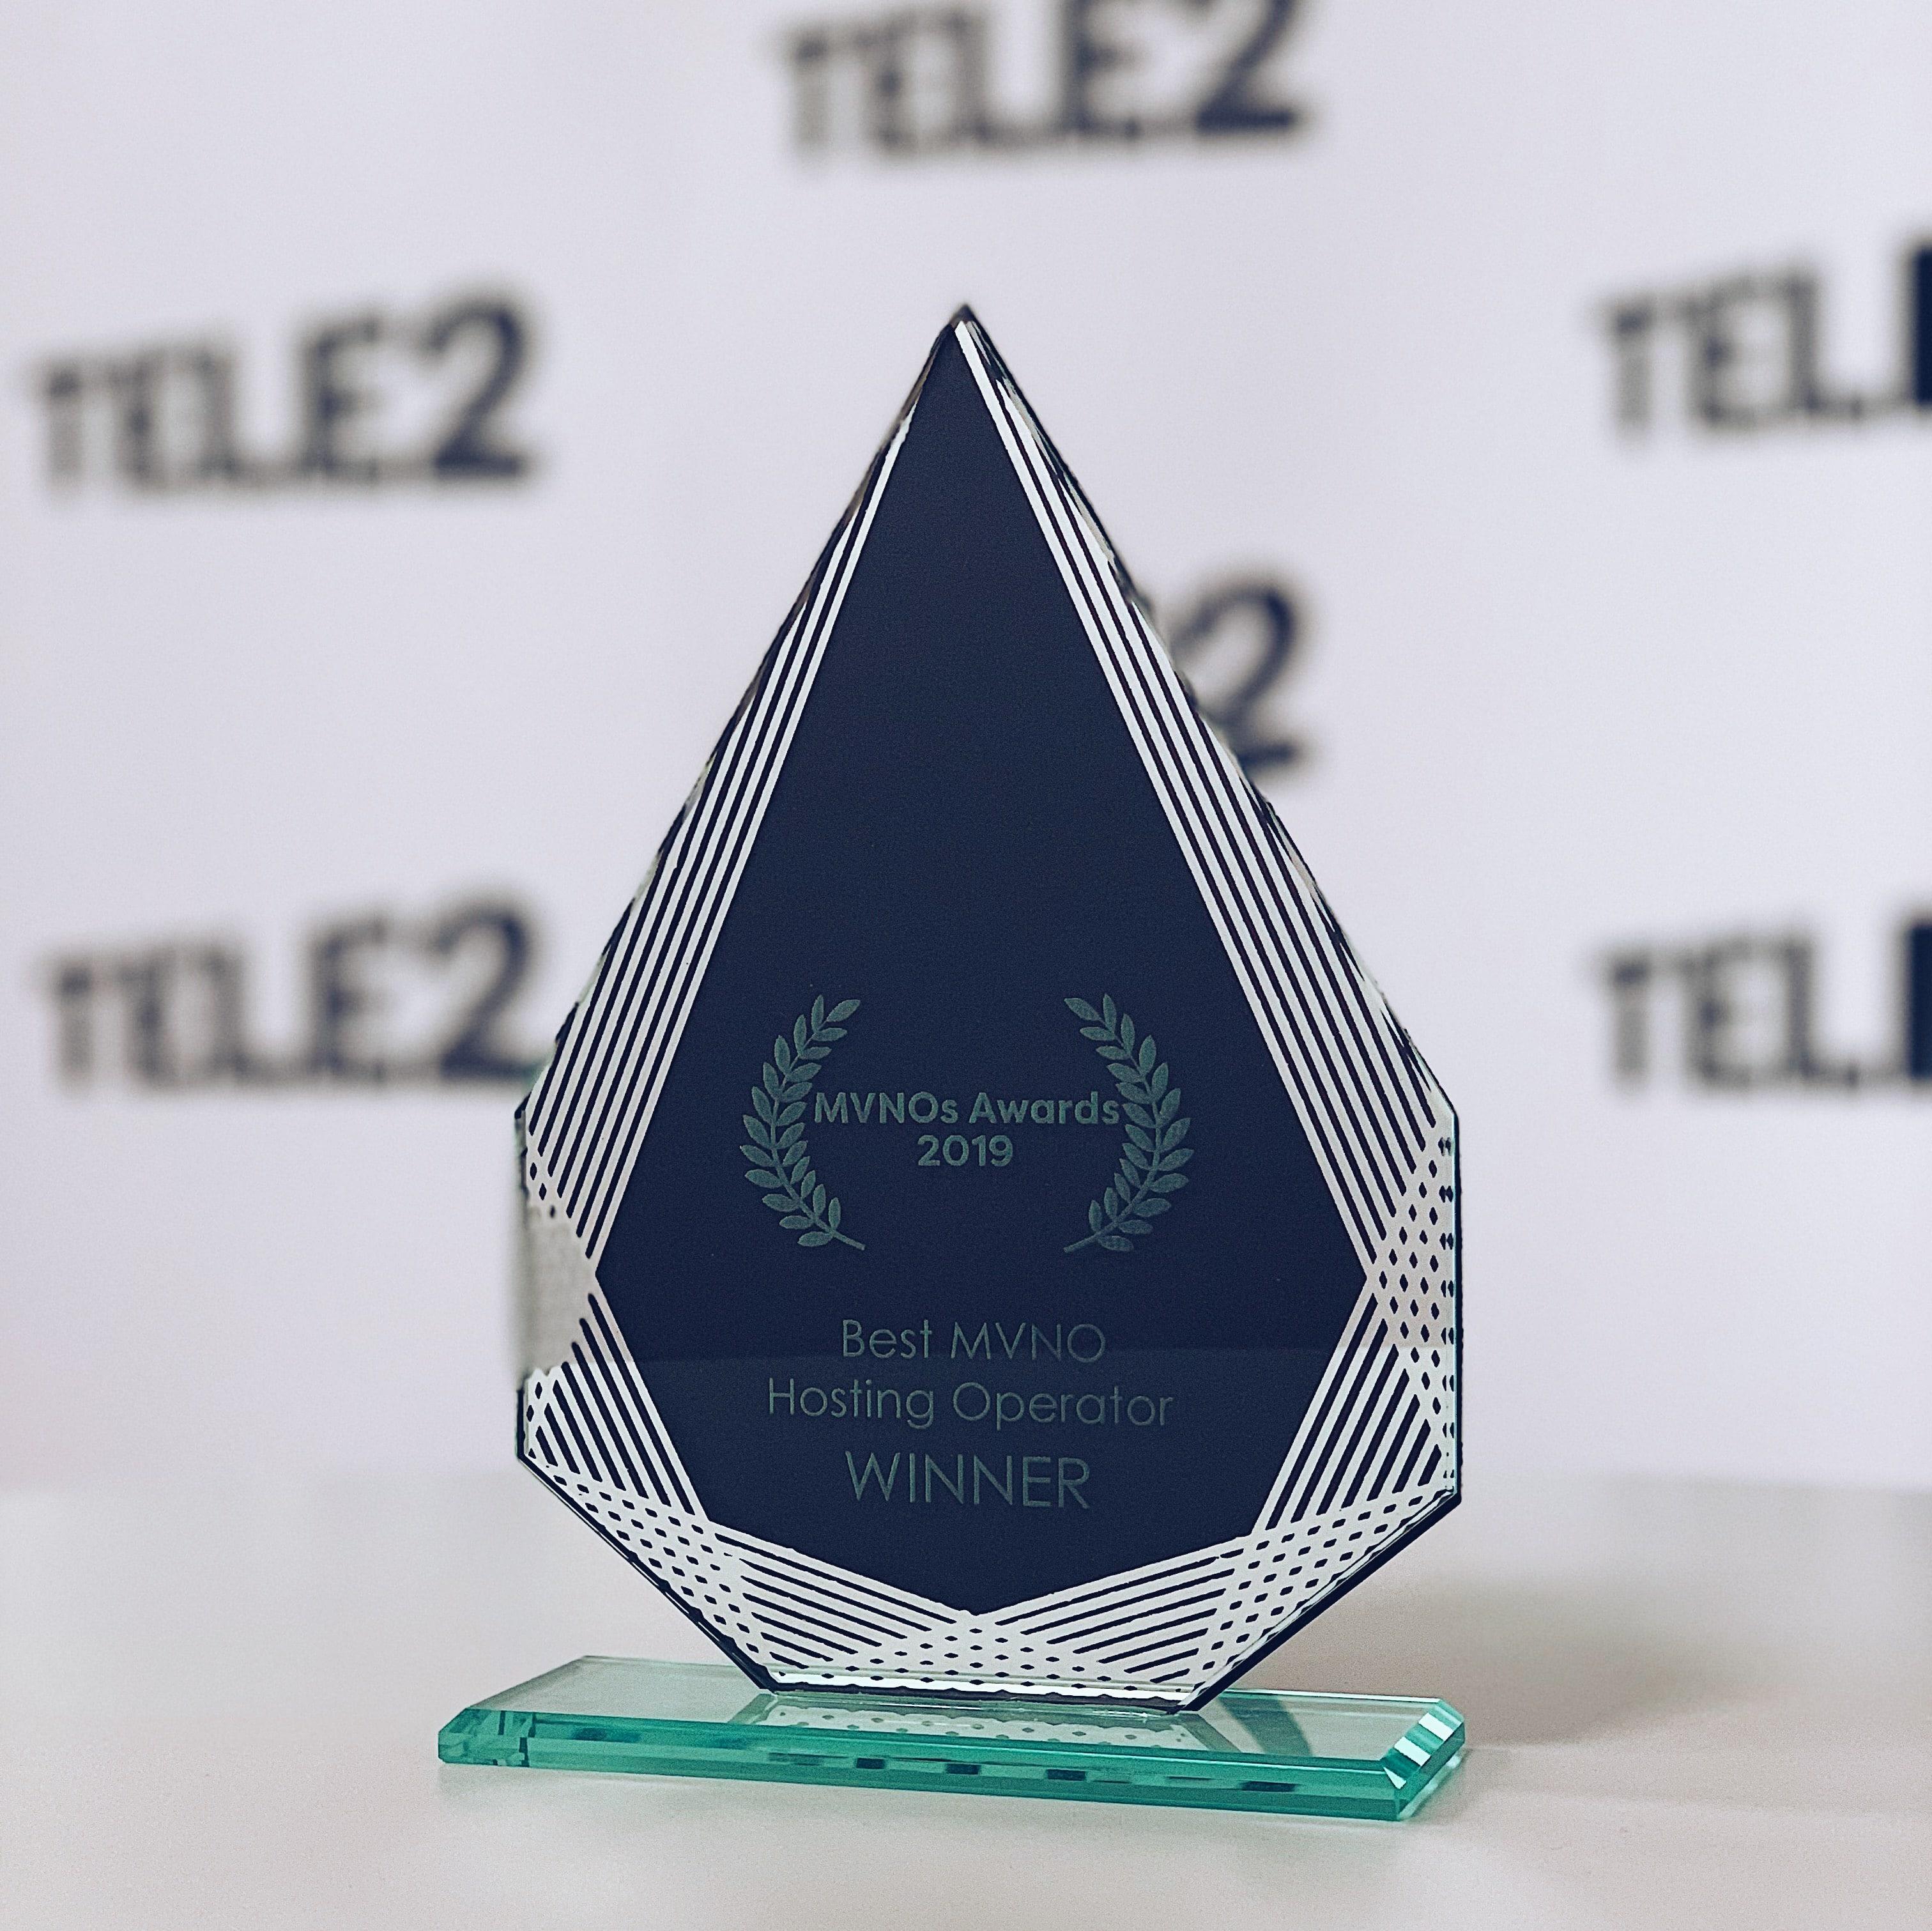 Tele2 названа лучшим мировым хост-оператором MVNO 1